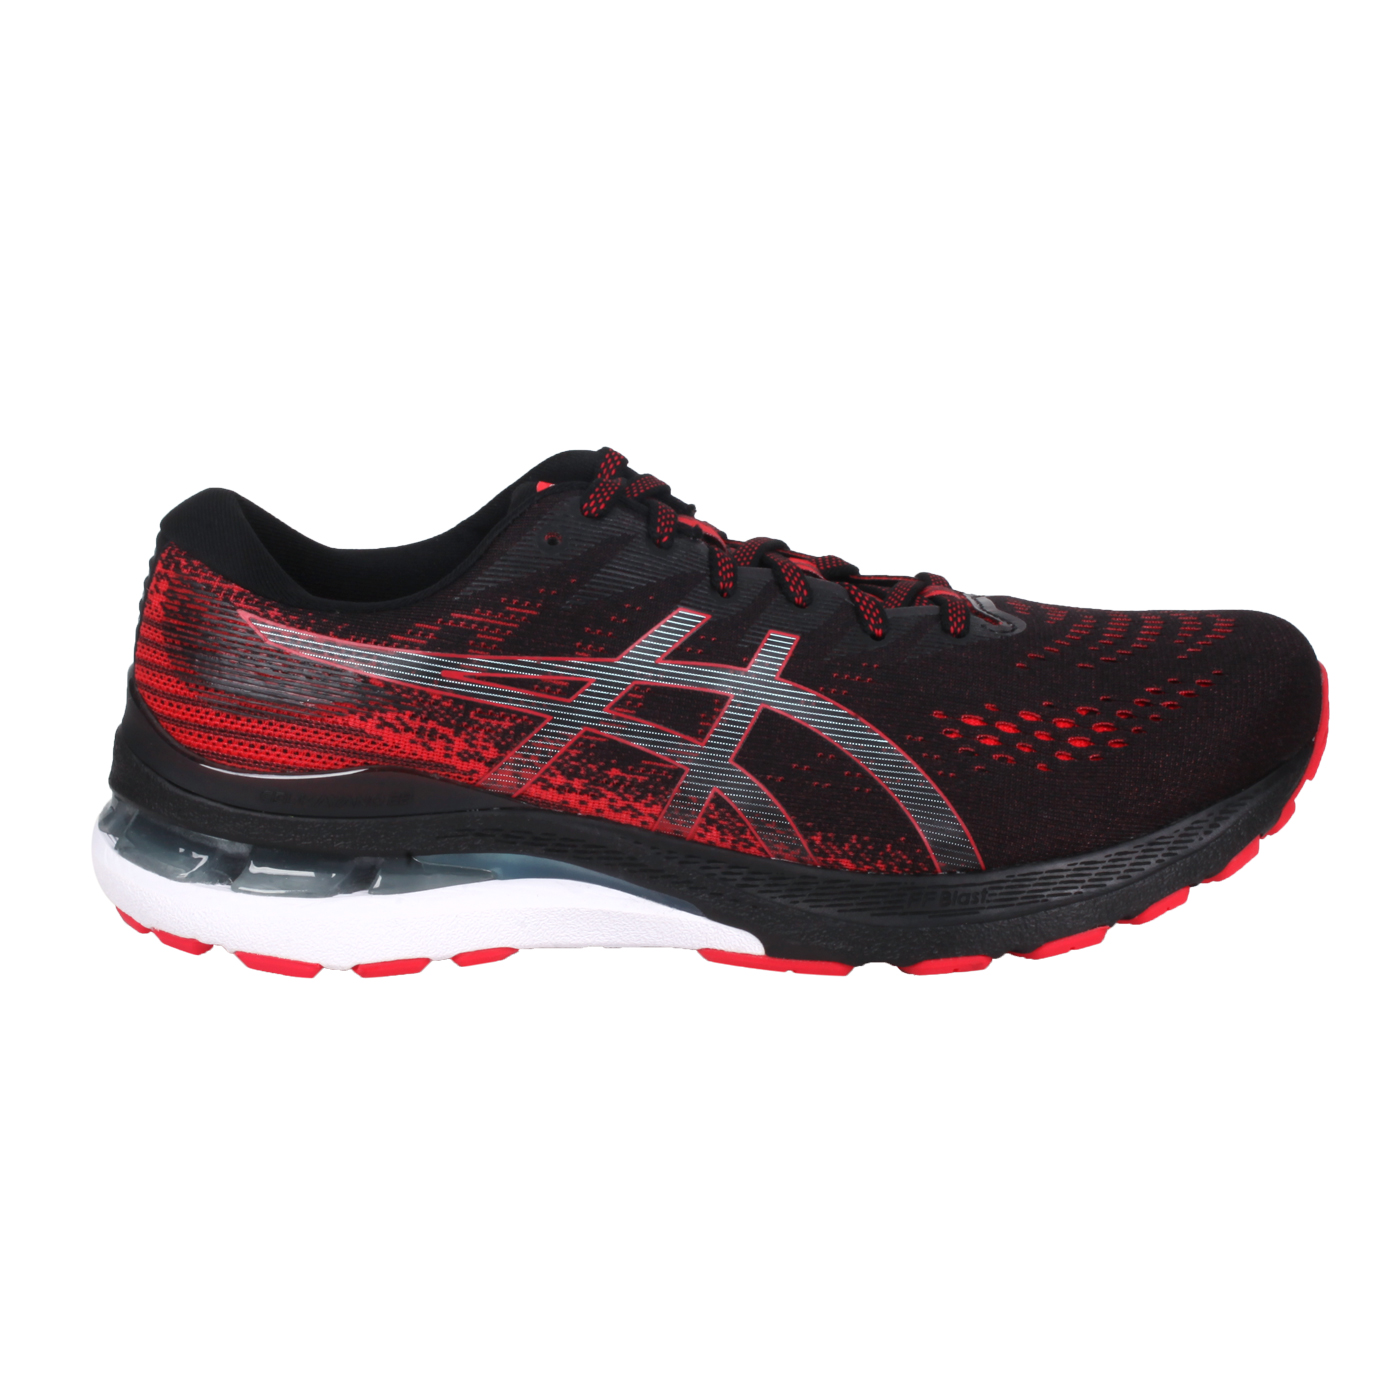 ASICS 男款慢跑鞋-4E  @GEL-KAYANO 28@1011B191-002